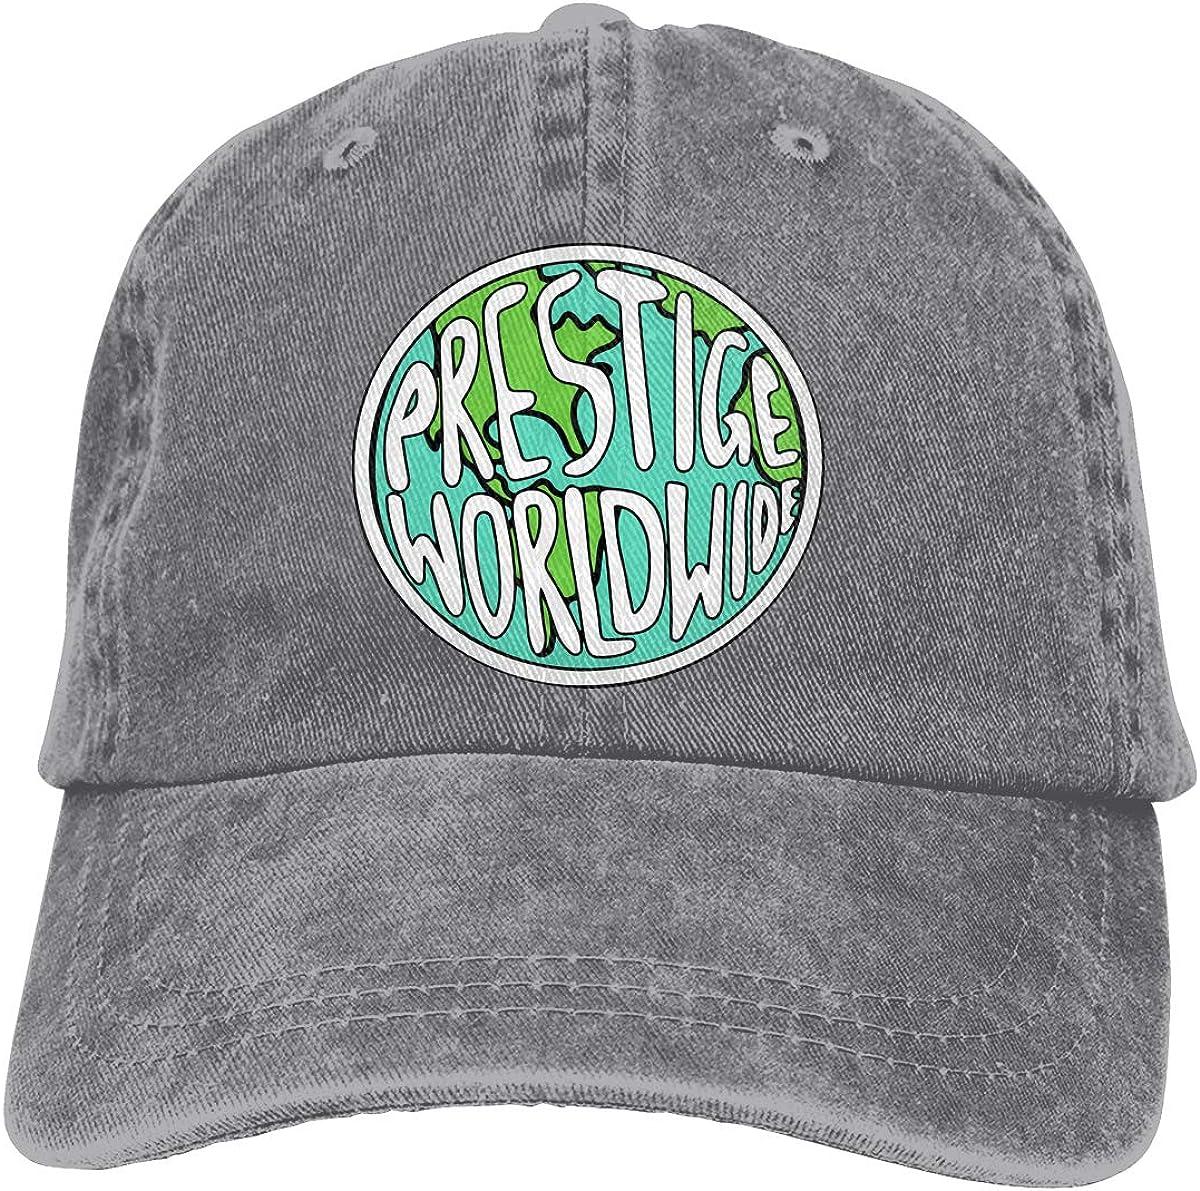 TBVS 77 Men Women Washed Yarn-Dyed Denim Baseball Cap Prestige Worldwide Plain Cap